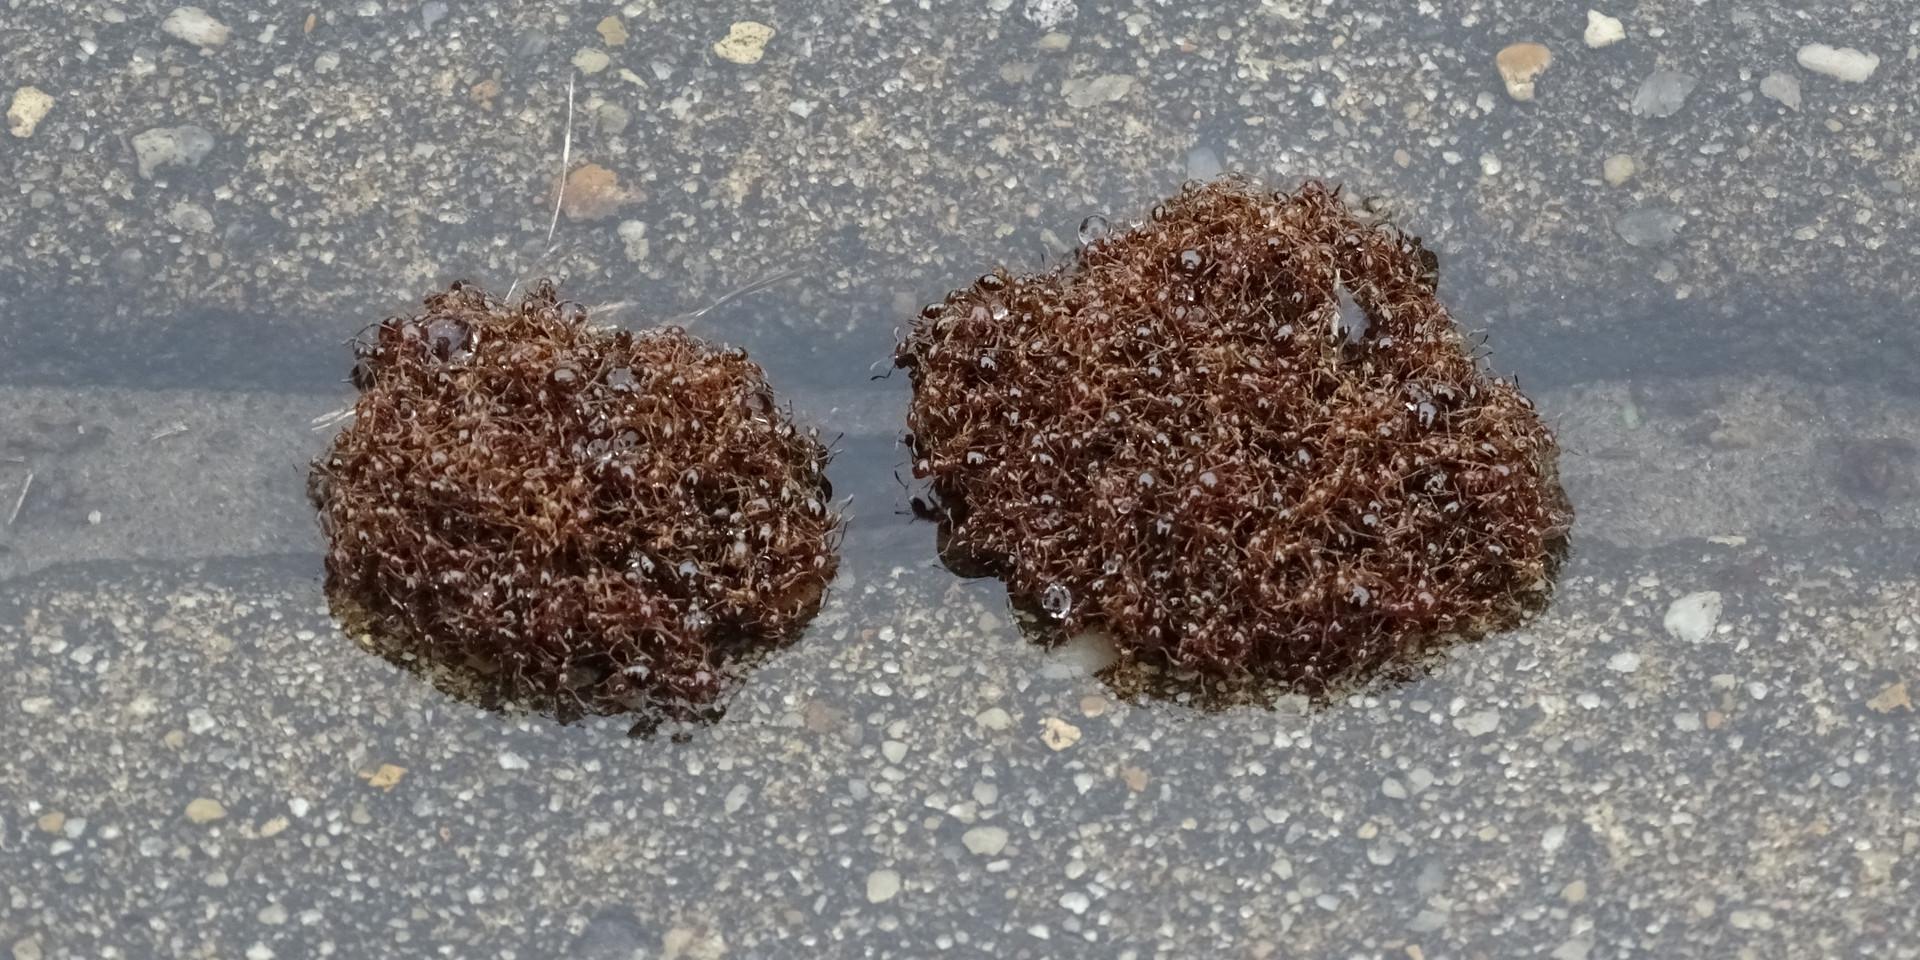 Ant islands